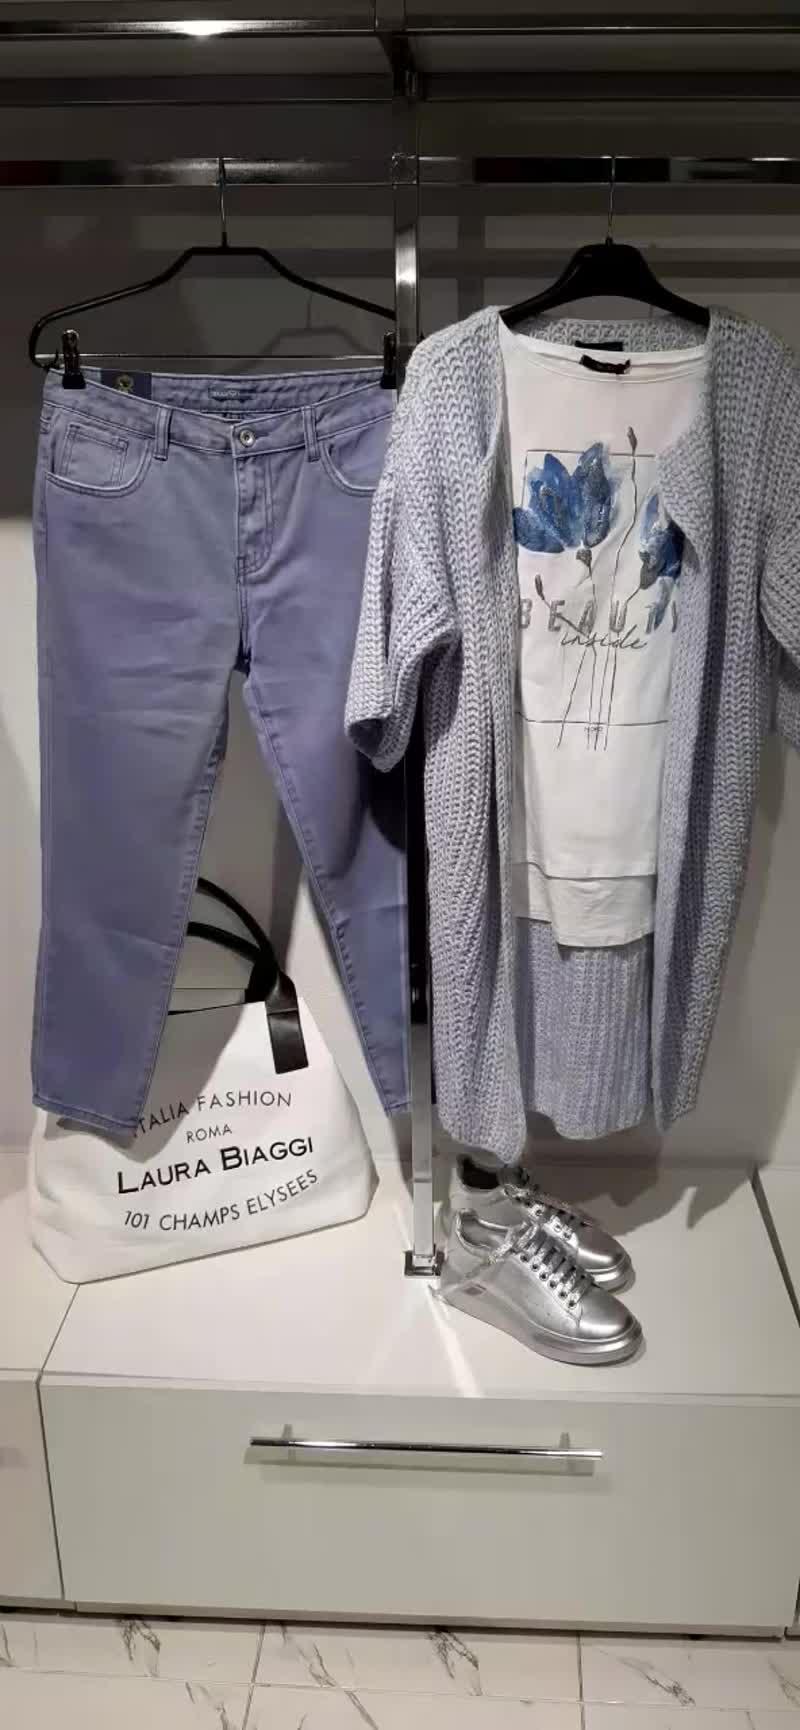 джинсы синие пуш ар кардиган голубой футболка цветок